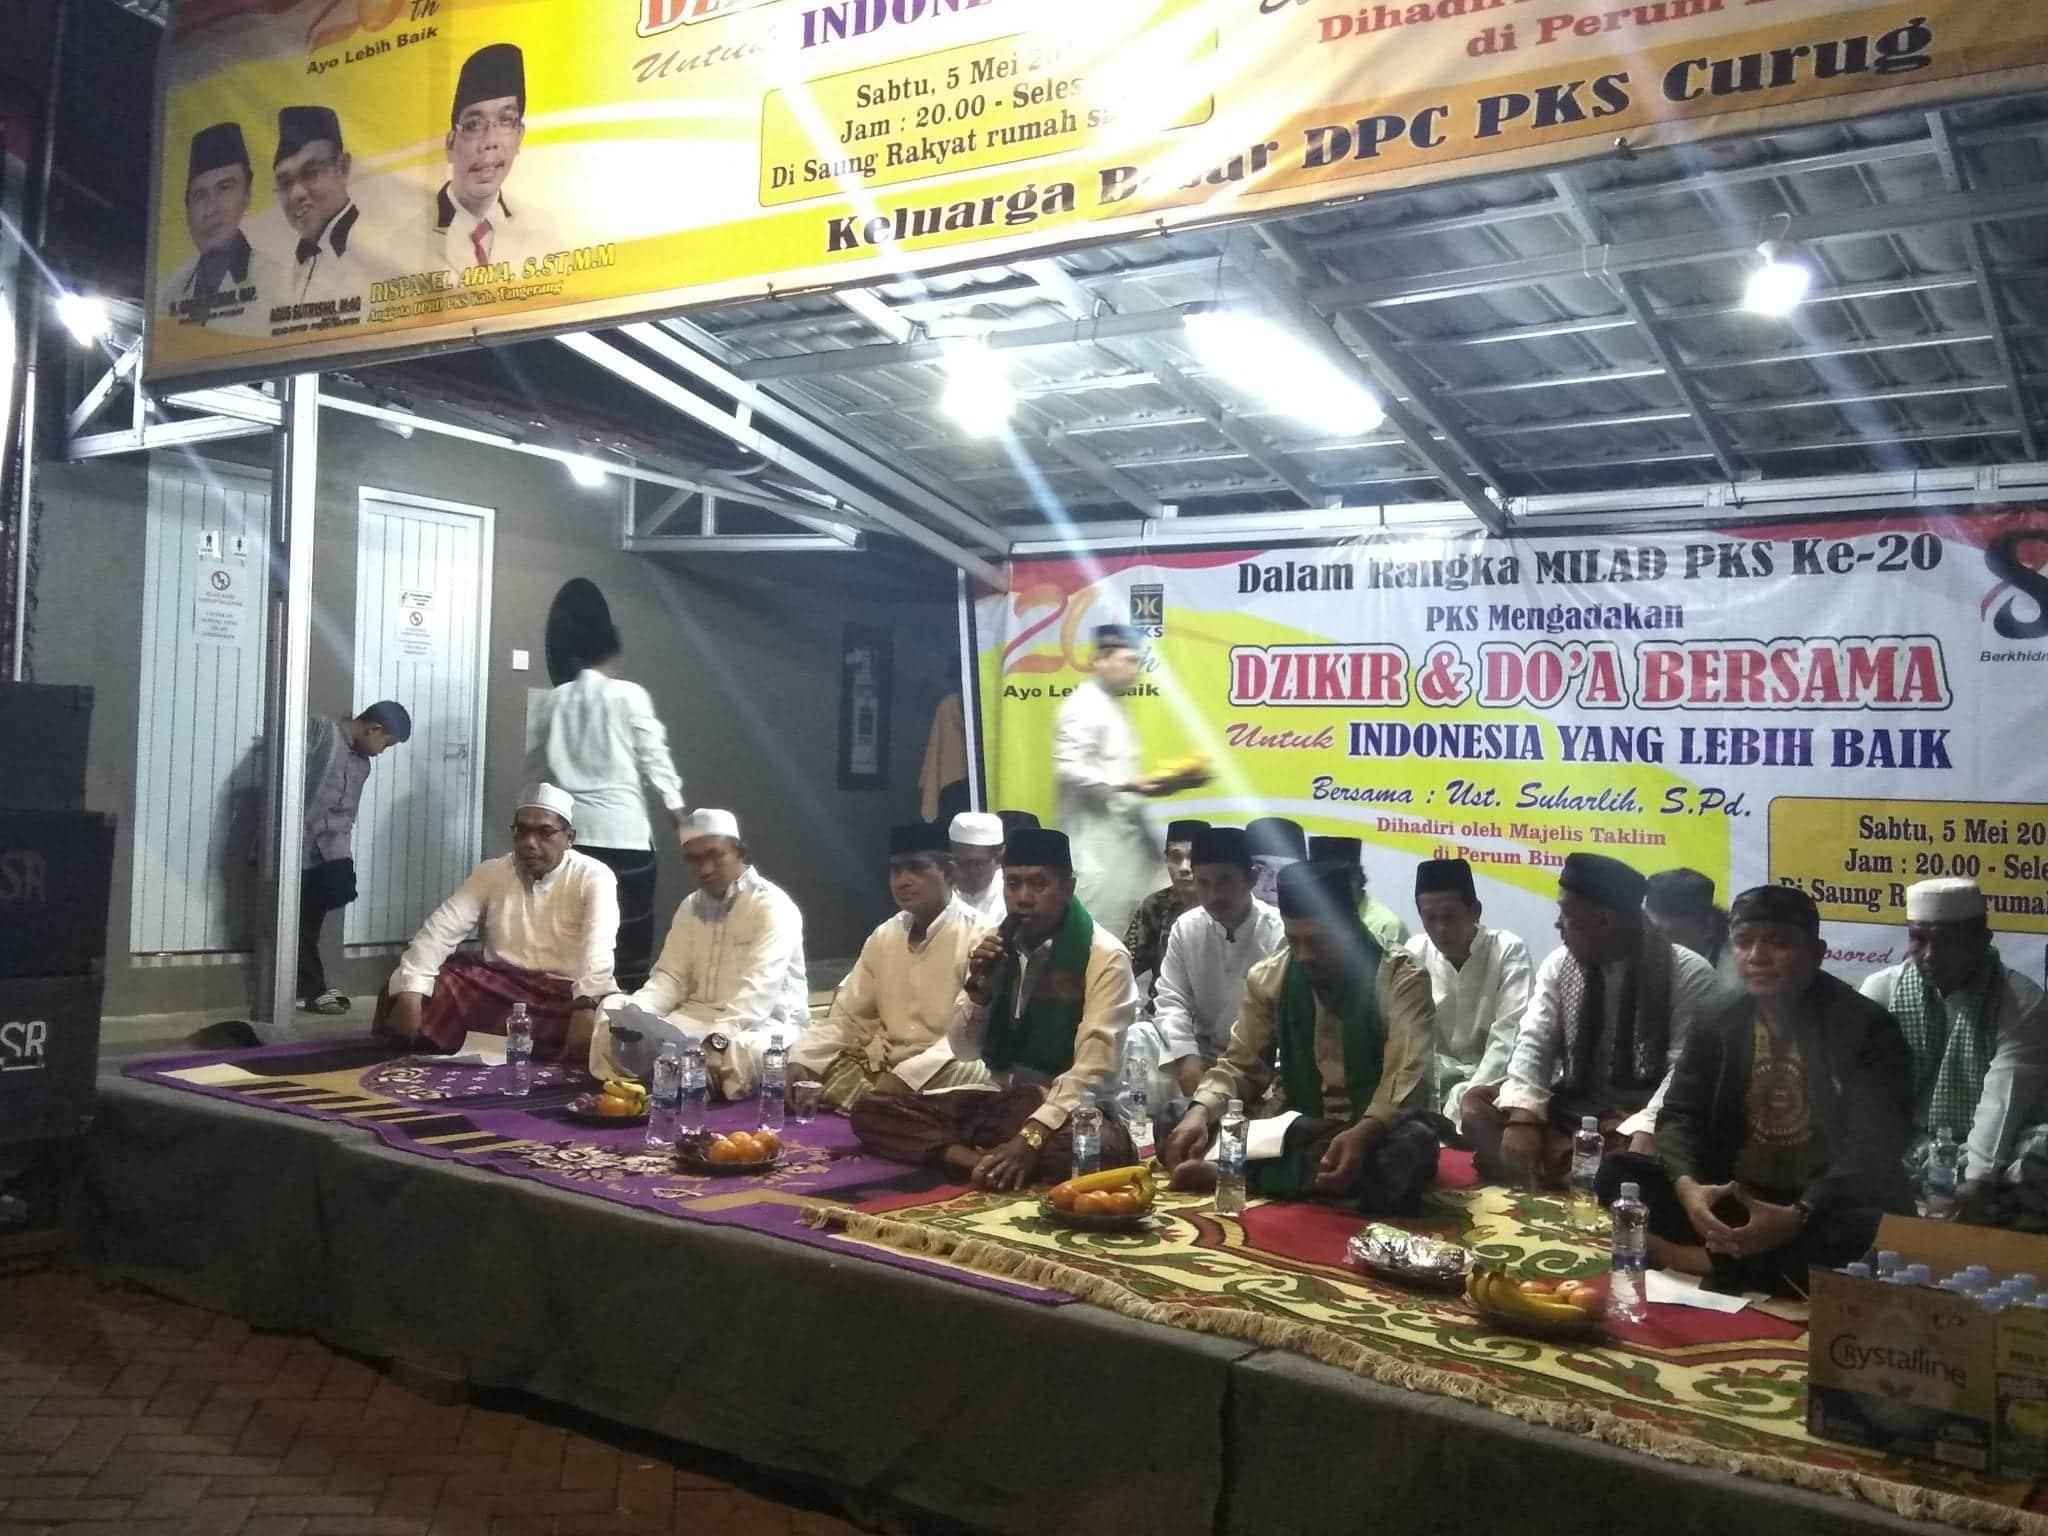 Dzikir Dan Do'a Bersama Rangka Milad PKS Ke 20 Rispanel Arya Bakal Calon Anggota Dewan DPRD Kab. Tangerang Kembali Di 2019